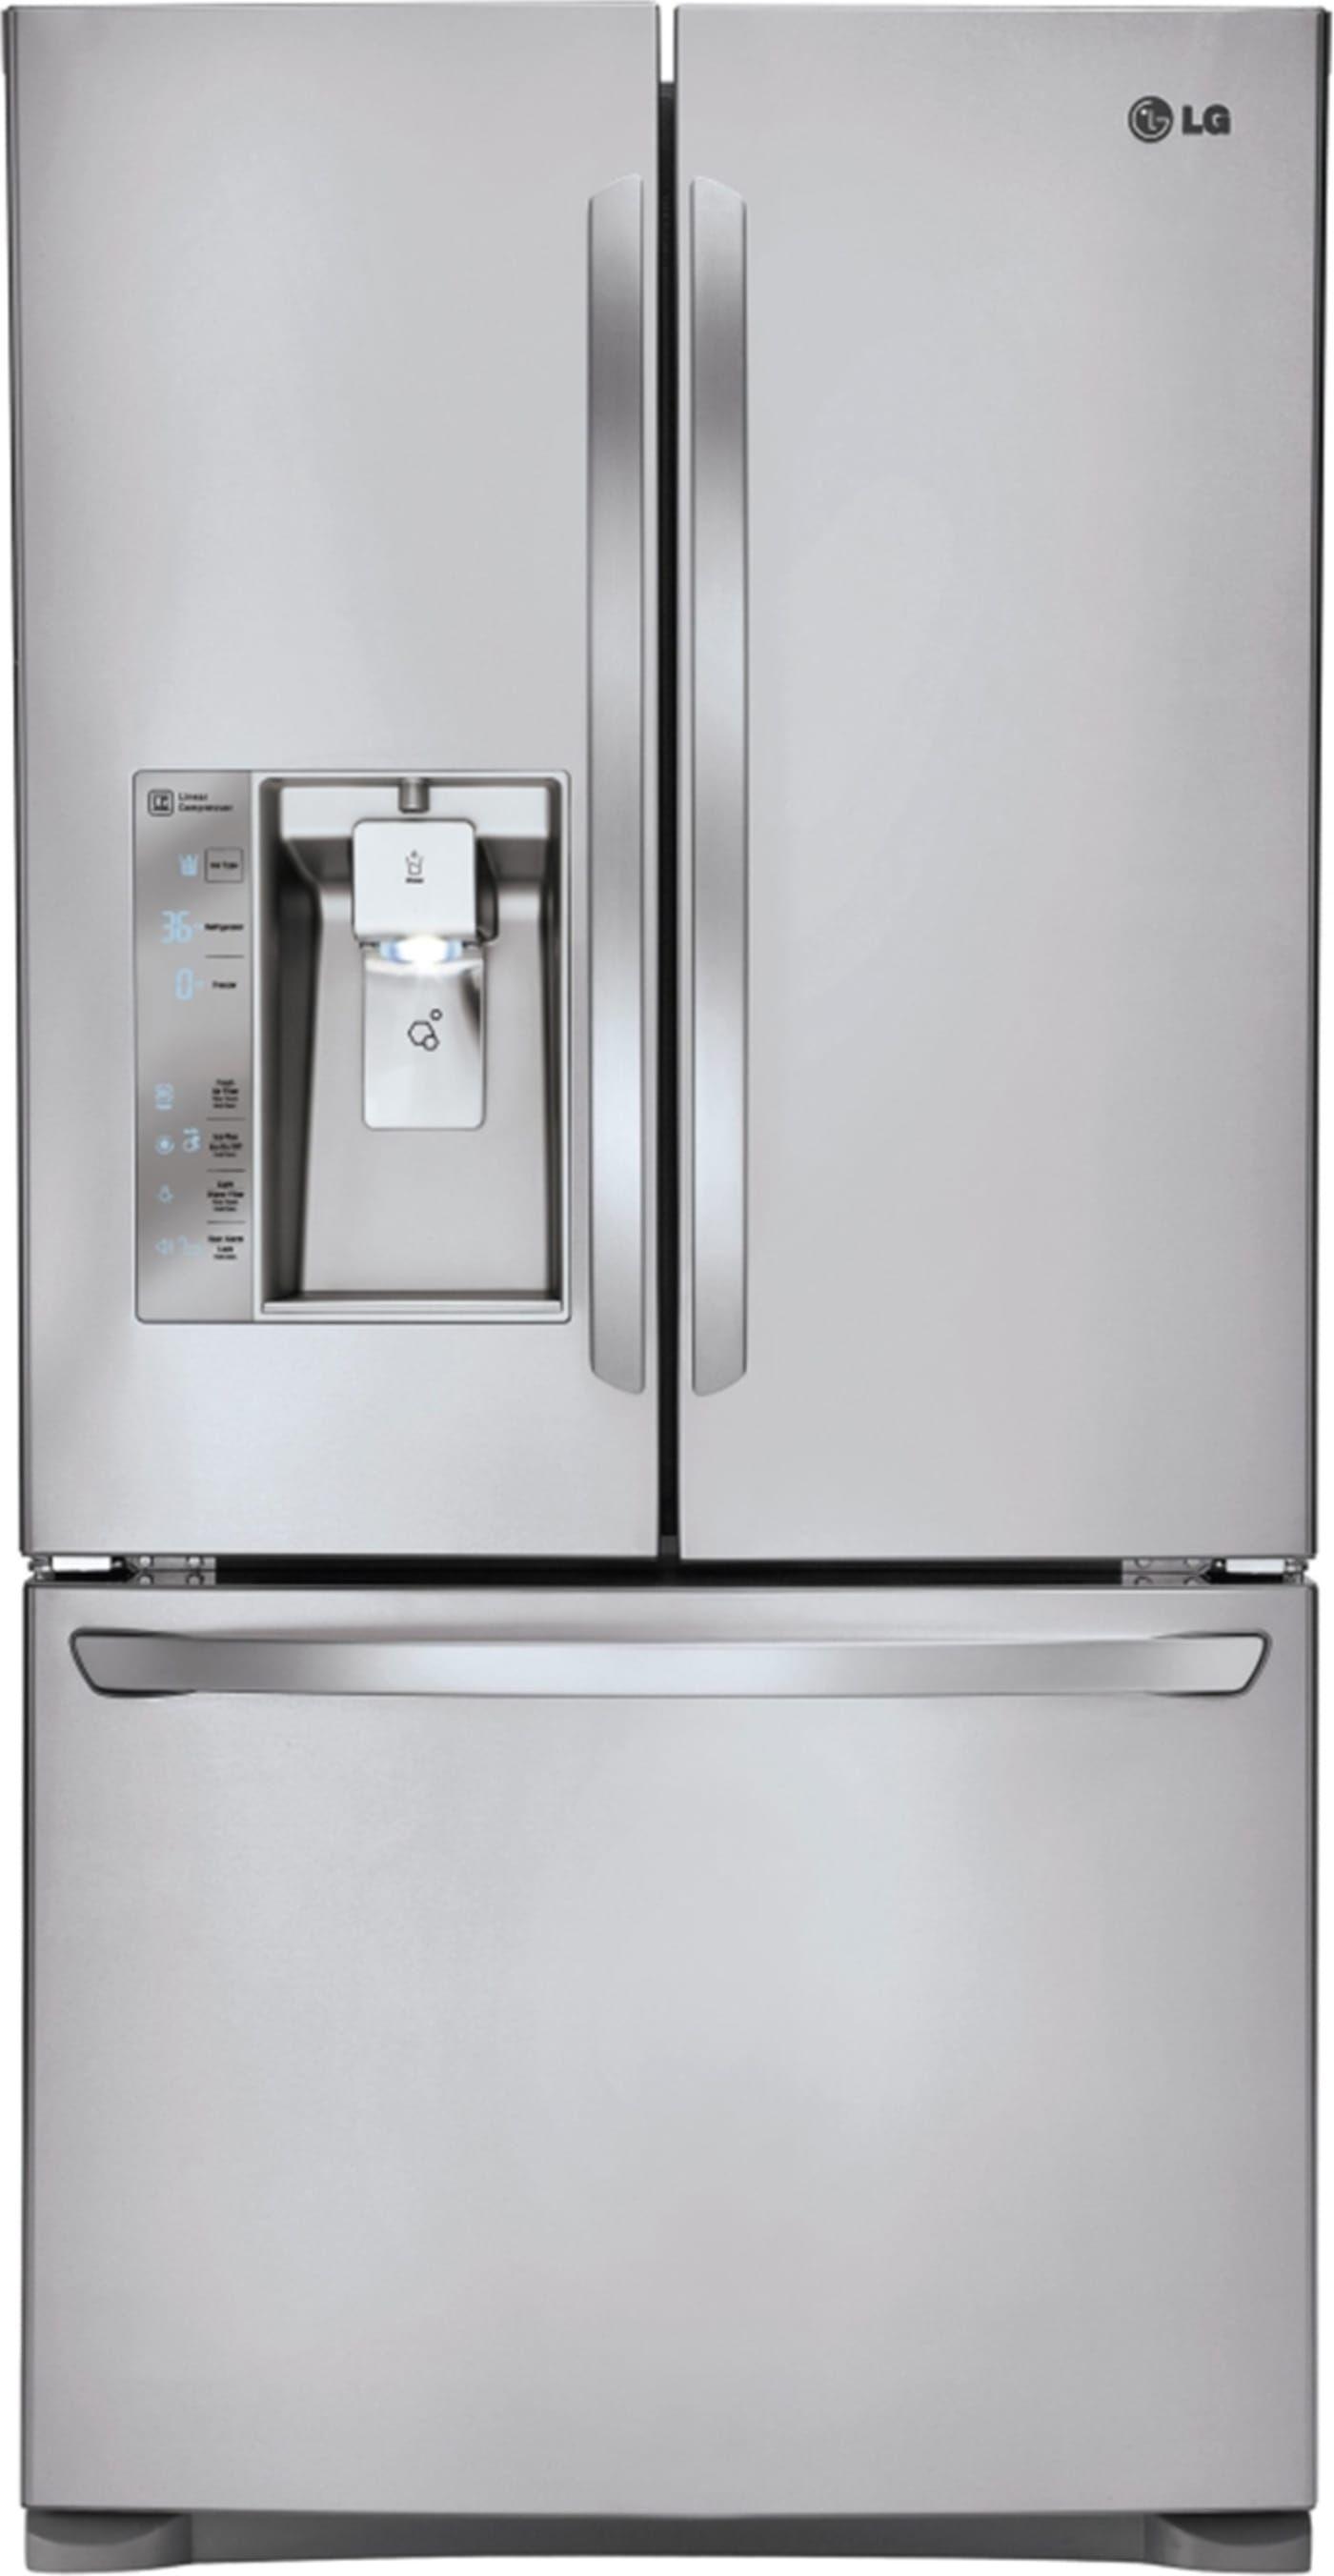 Lfxc24726s By Lg French Door Refrigerators Goedekers Com